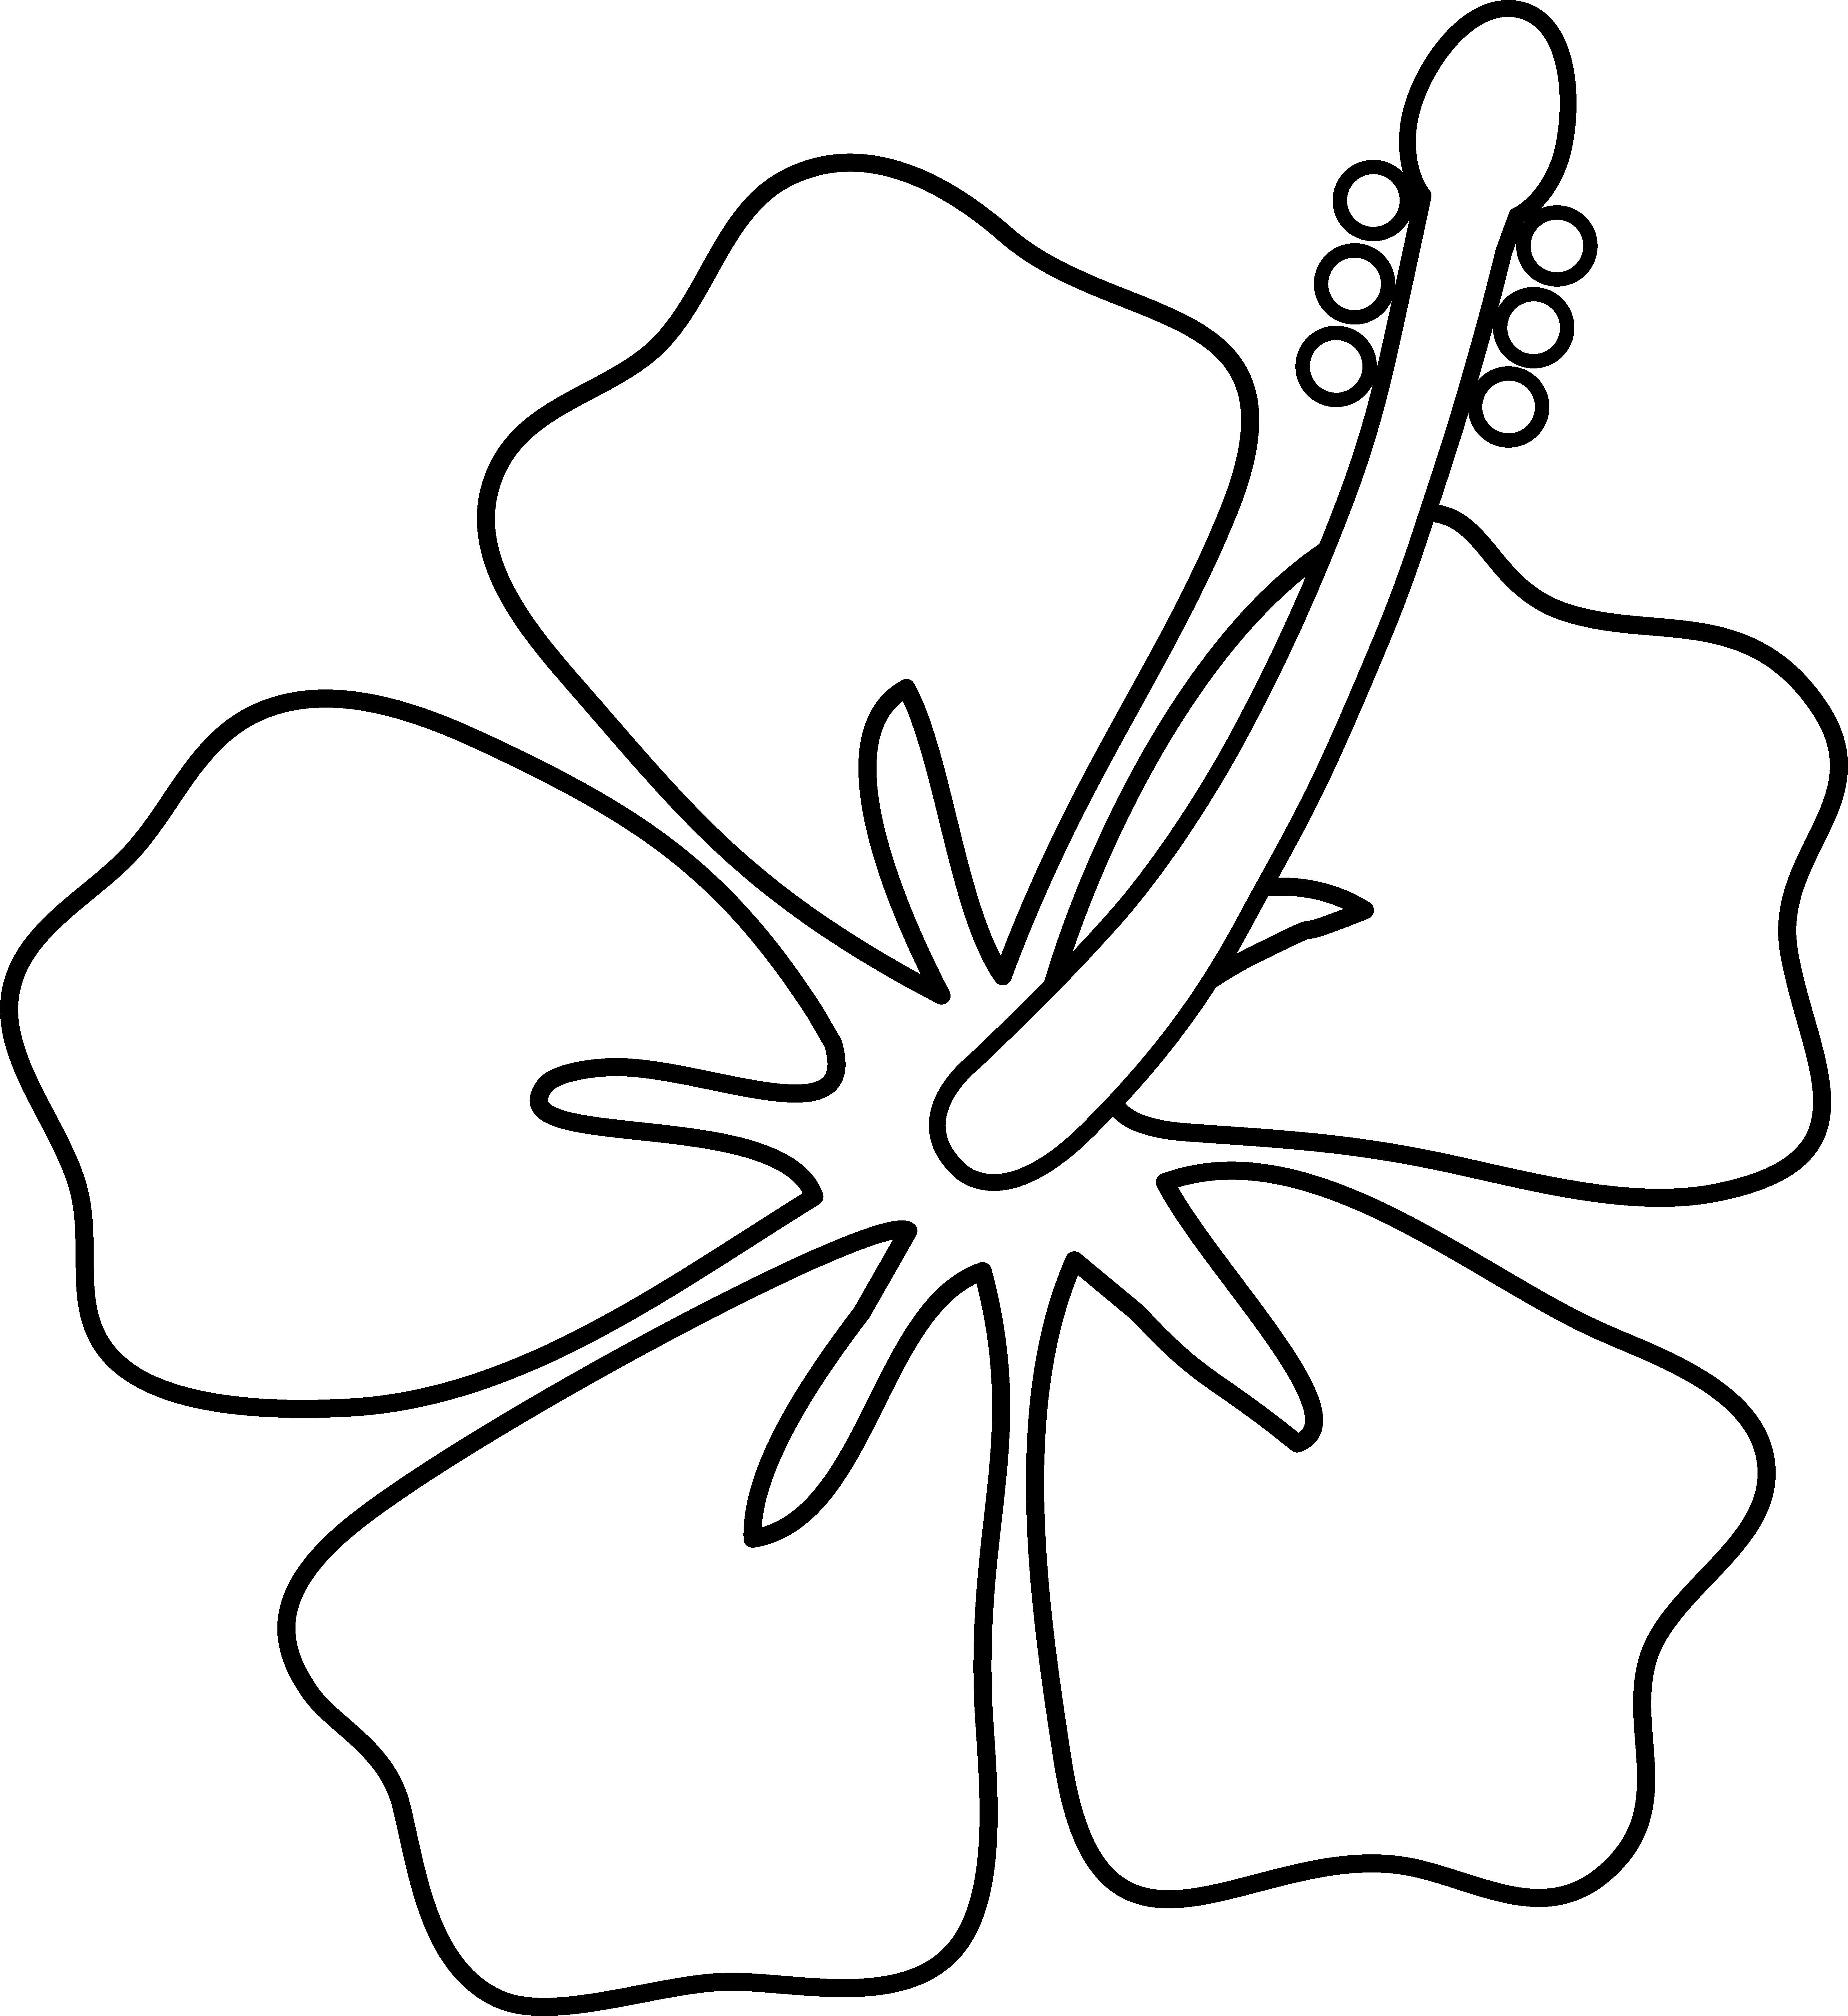 5922x6462 Drawings On Hawaiian Flowers Best 15 Post Media For Cartoon